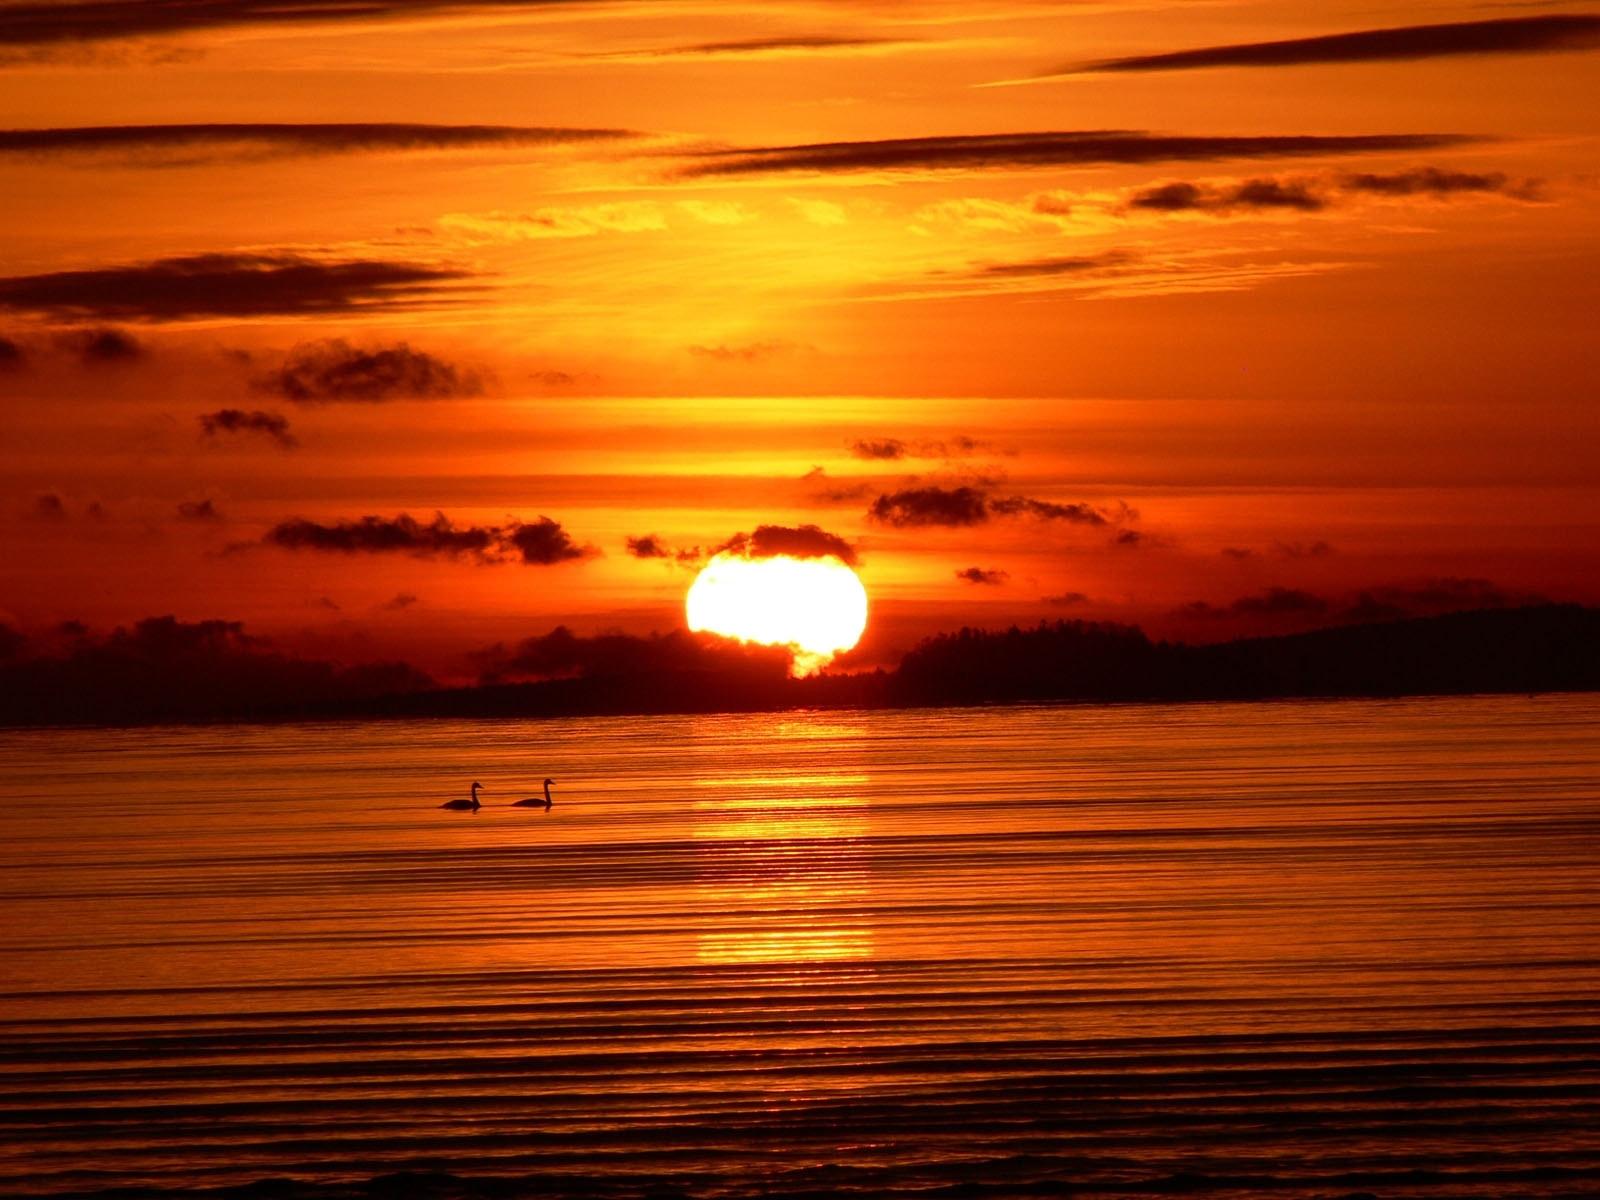 Download mobile wallpaper Sun, Sunset, Sea, Landscape for free.